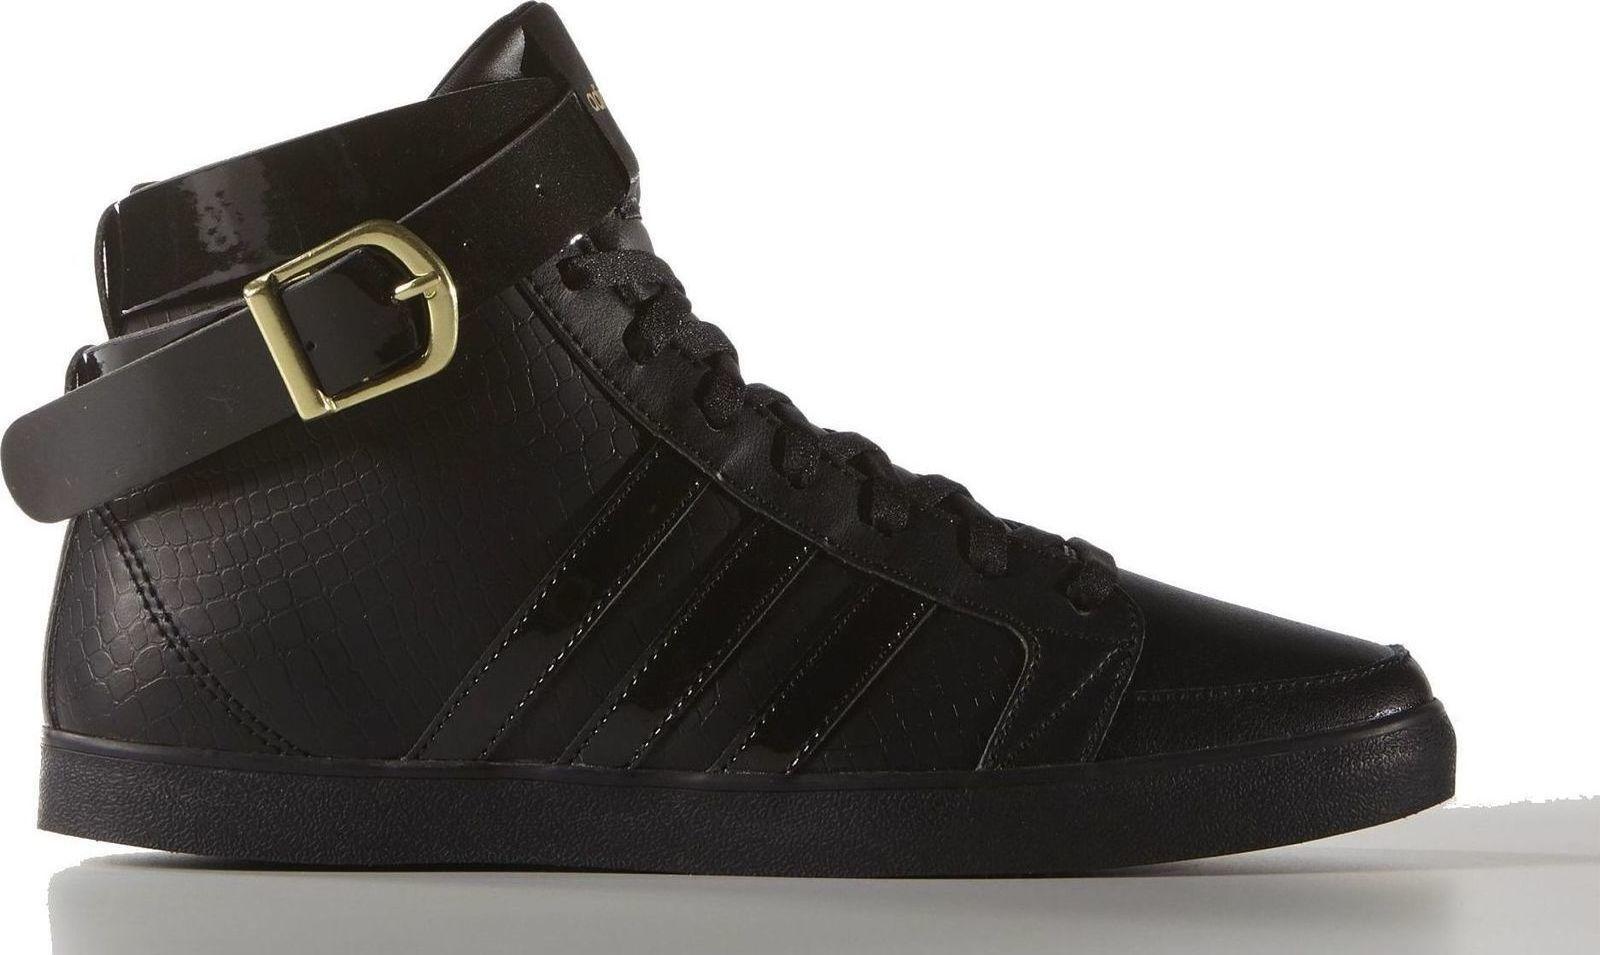 Adidas Daily Twist Lx Mid Schuhe Weiß Damen Neo, Adidas